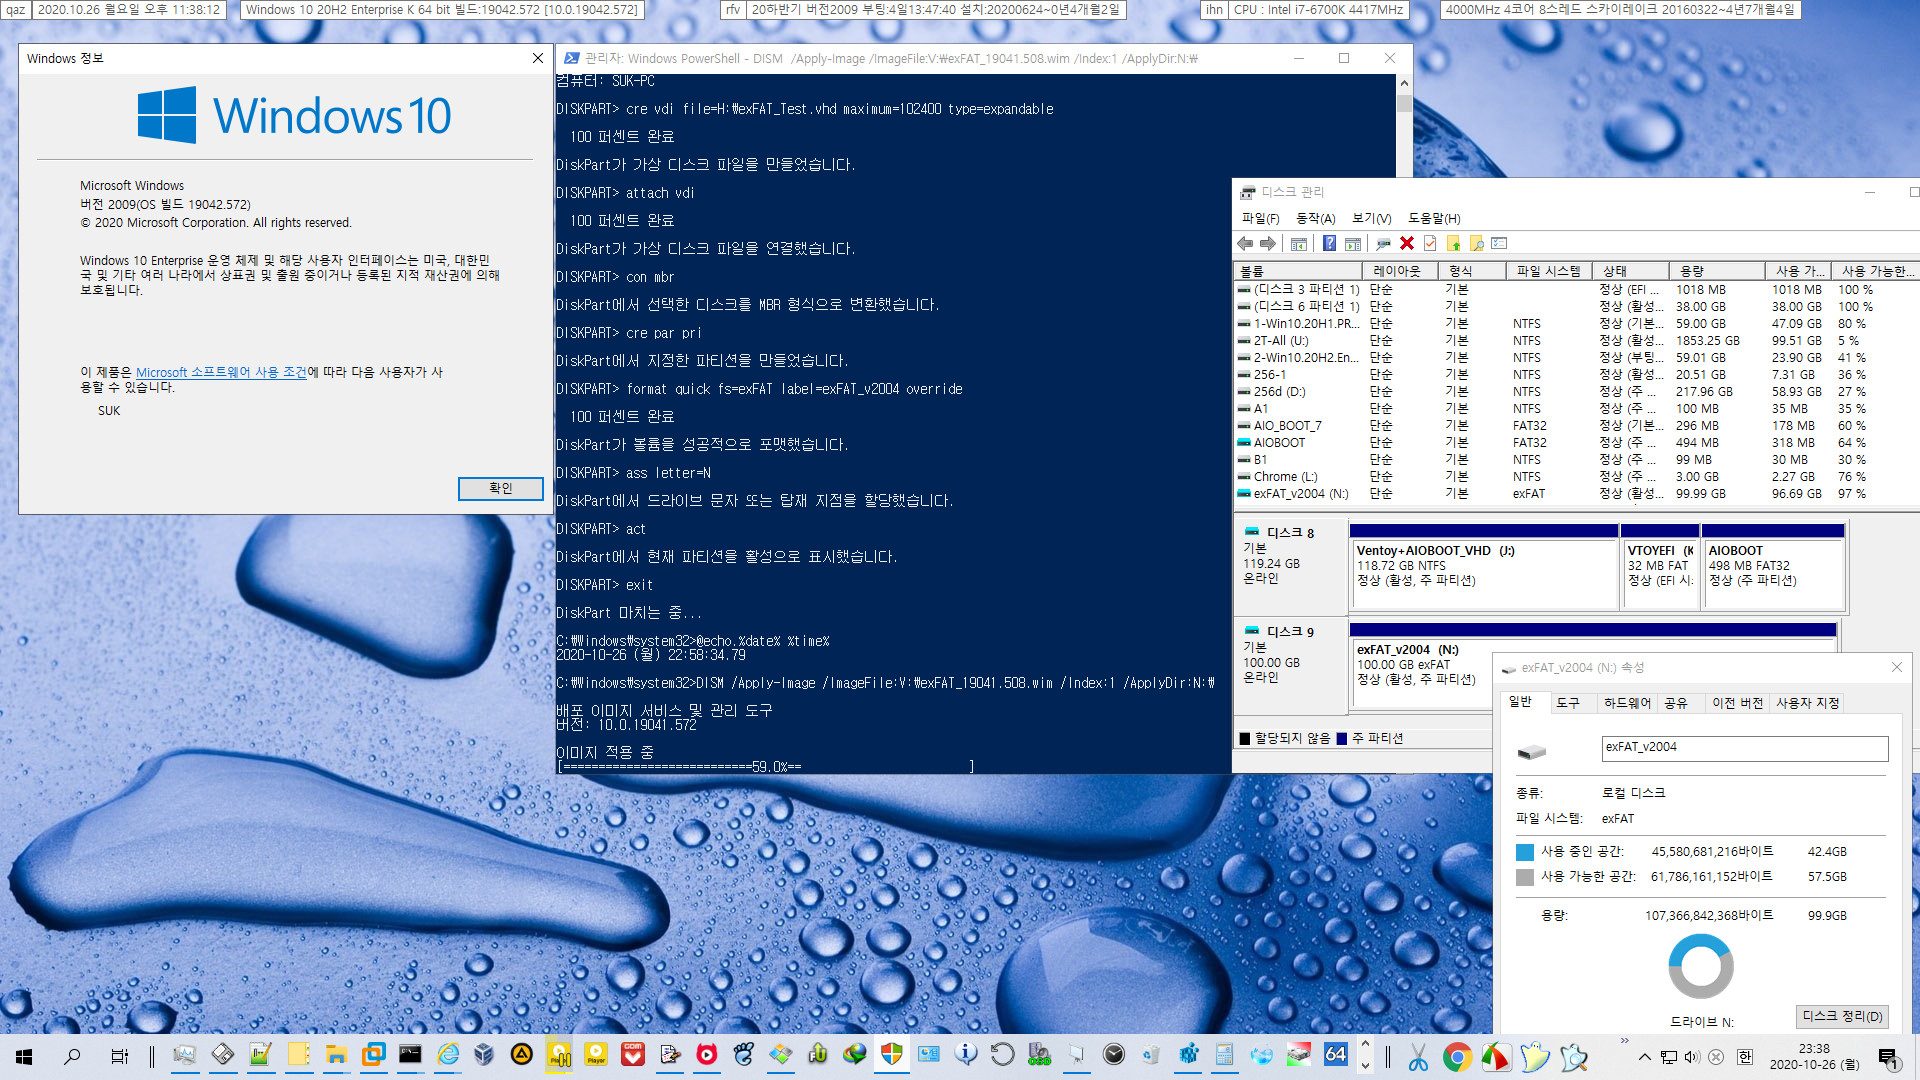 exFAT 포맷으로도 VHD 부팅이 Windows 10 버전 1903부터 된다고 하여 테스트 - 생고생만 하다가 컴퓨터 먹통 2번이나 되고 그만뒀습니다 2020-10-26_233812.jpg